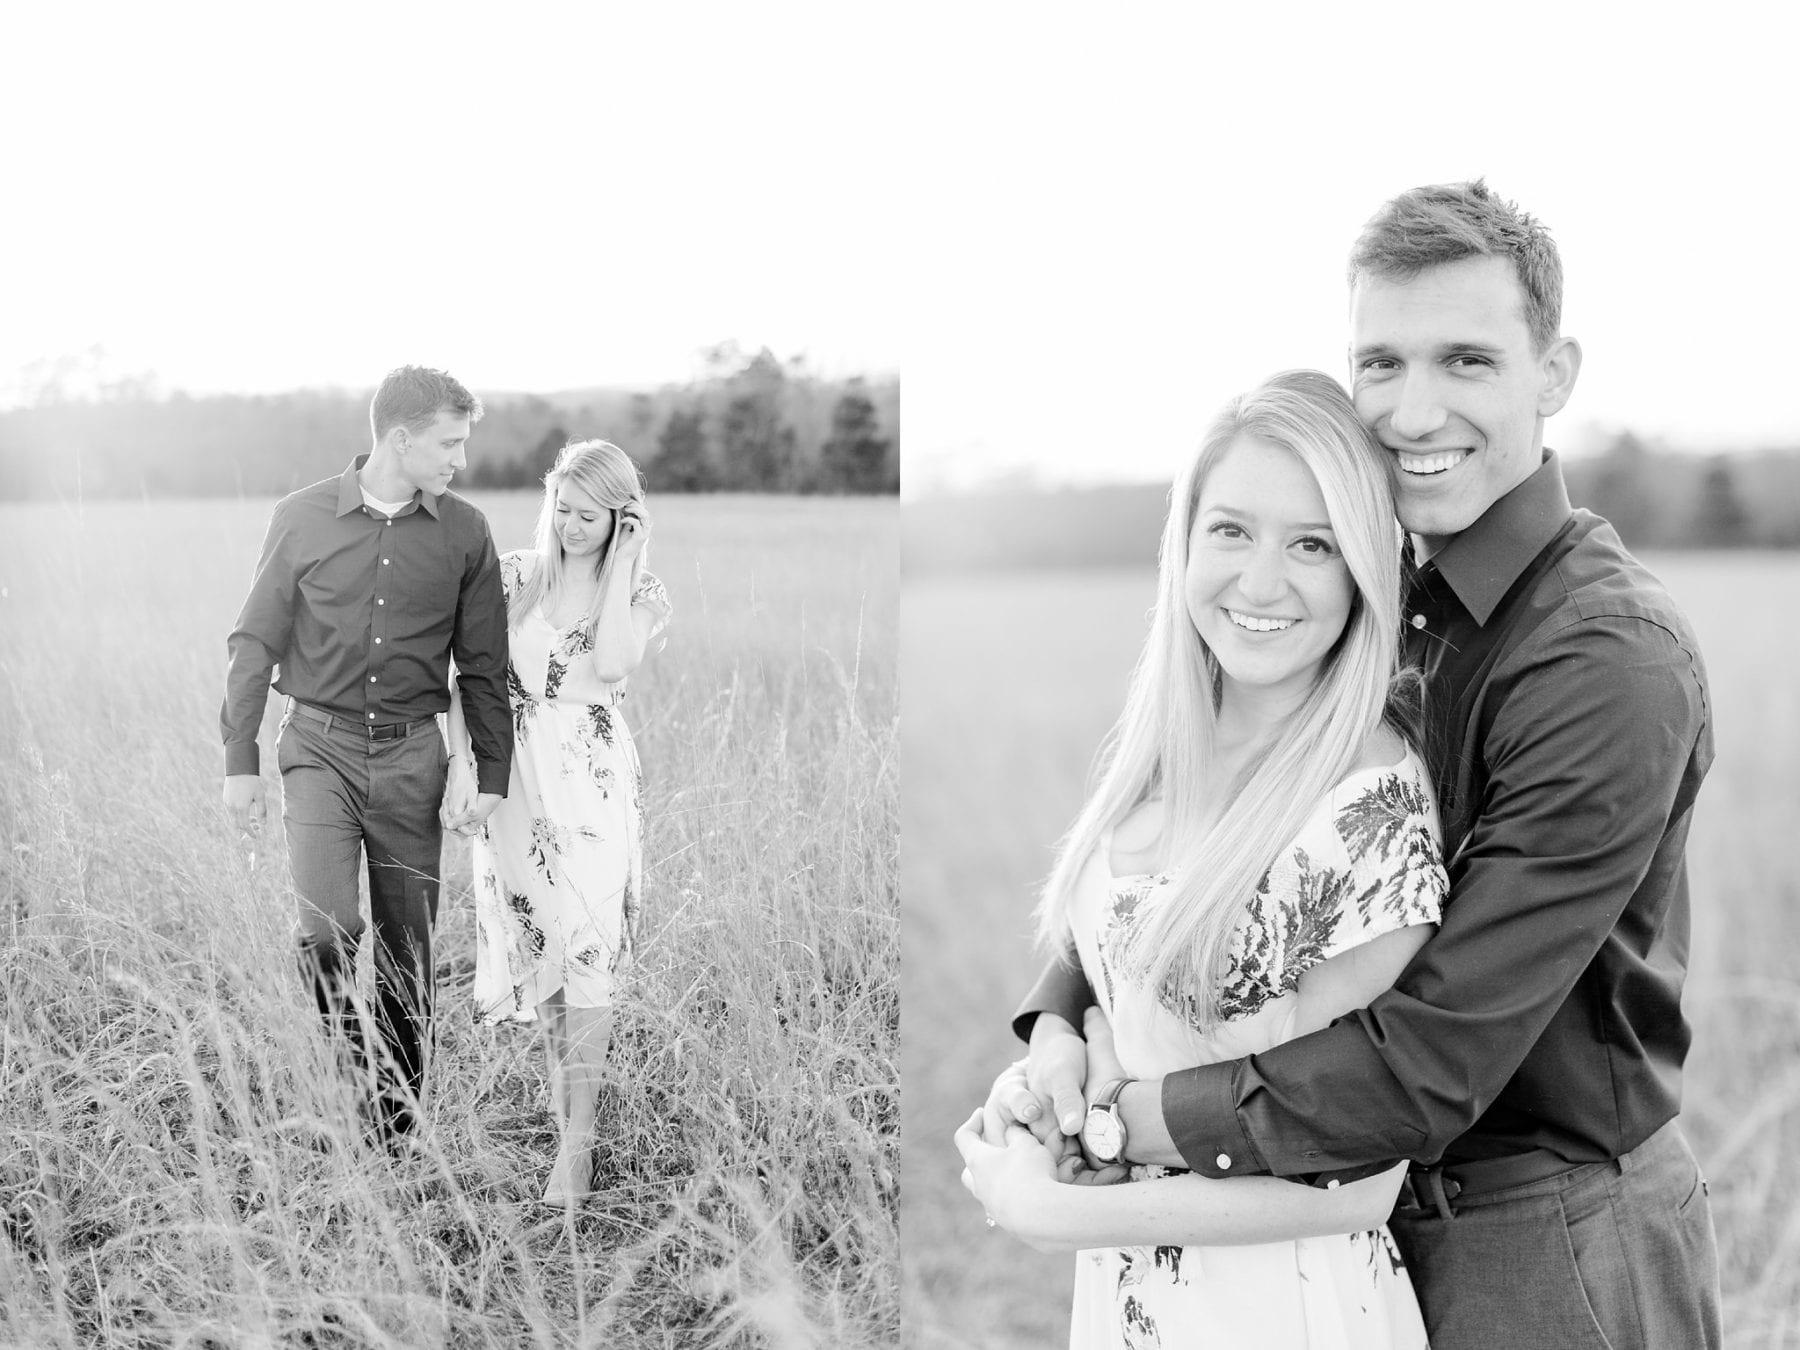 Manassas Battlefield Engagement Session Virginia Wedding Photographer Danielle & Charlie Megan Kelsey Photography-6217-2.jpg